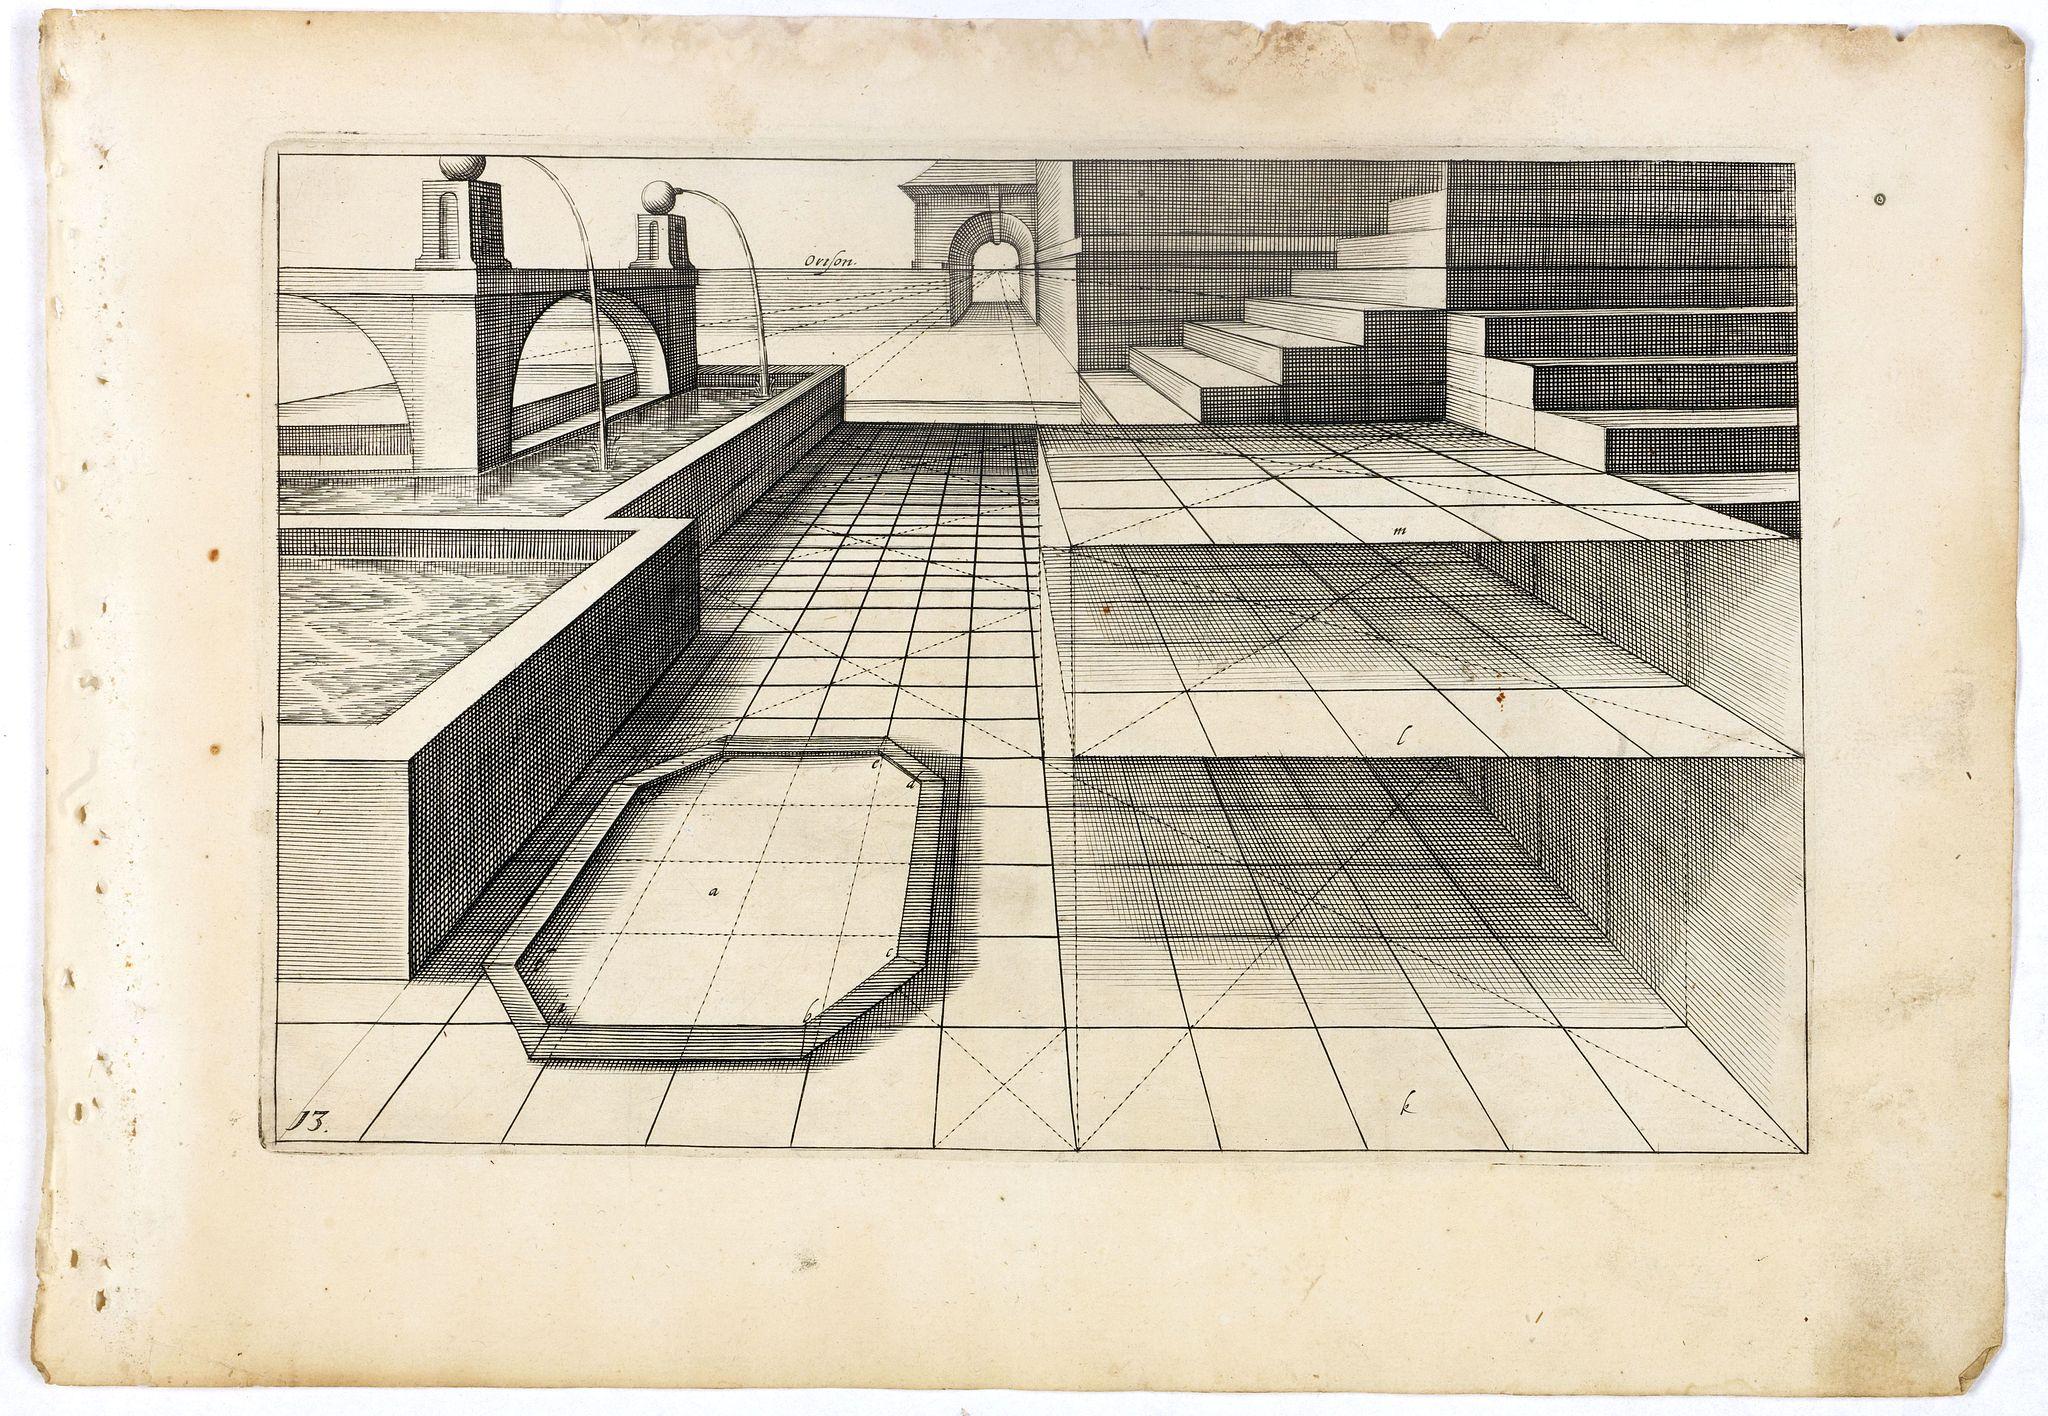 VREDEMAN DE VRIES, J. / HONDIUS, H. -  Perspective print by Vredeman de Vries. 13.